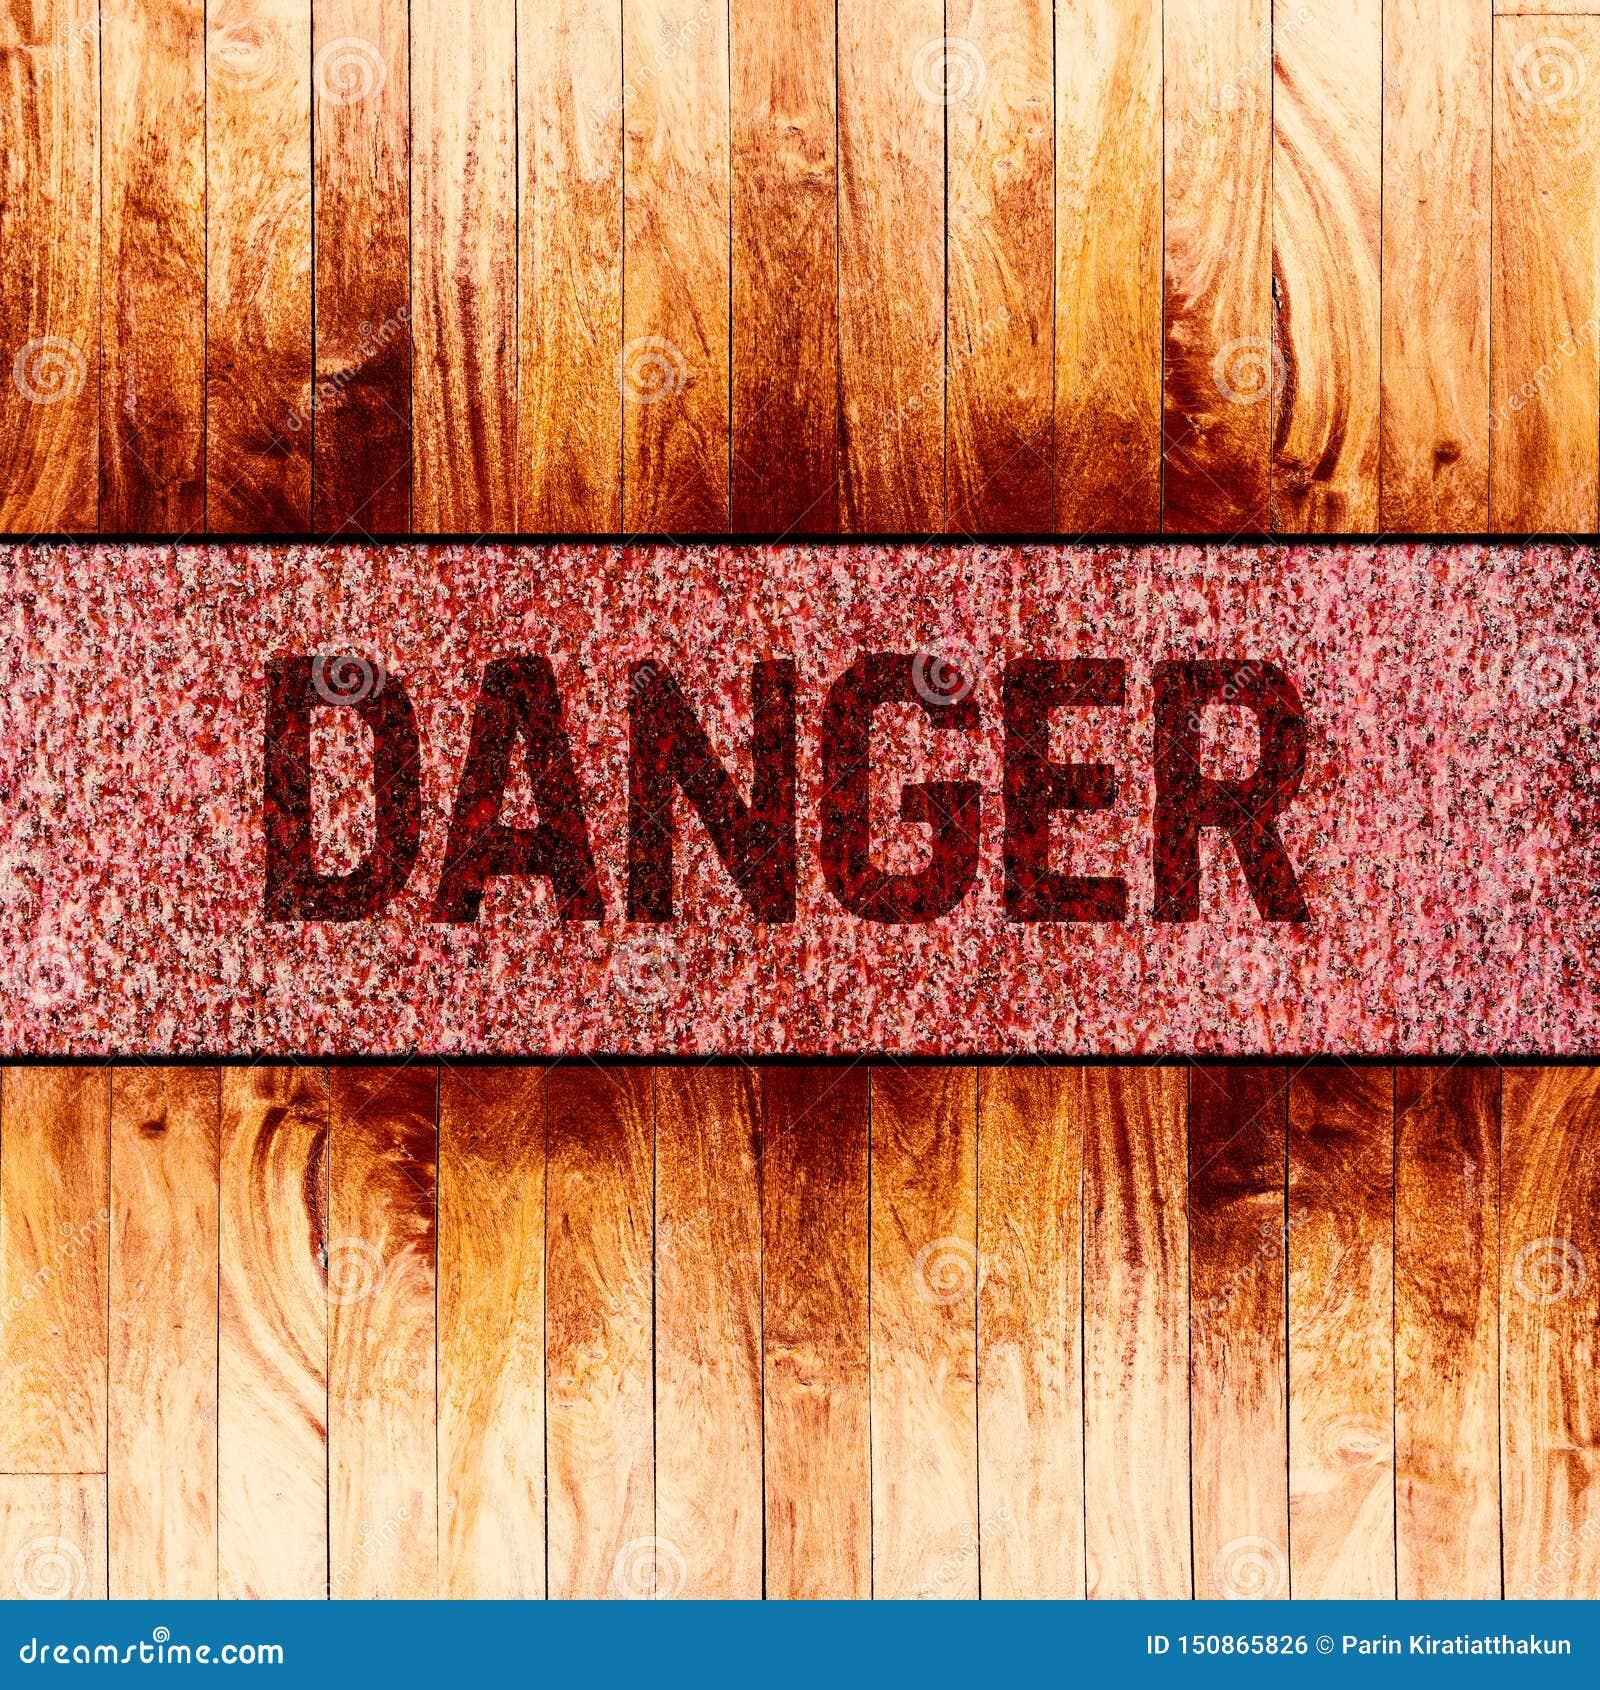 Texto do sinal de aviso do perigo no fundo oxidado do metal